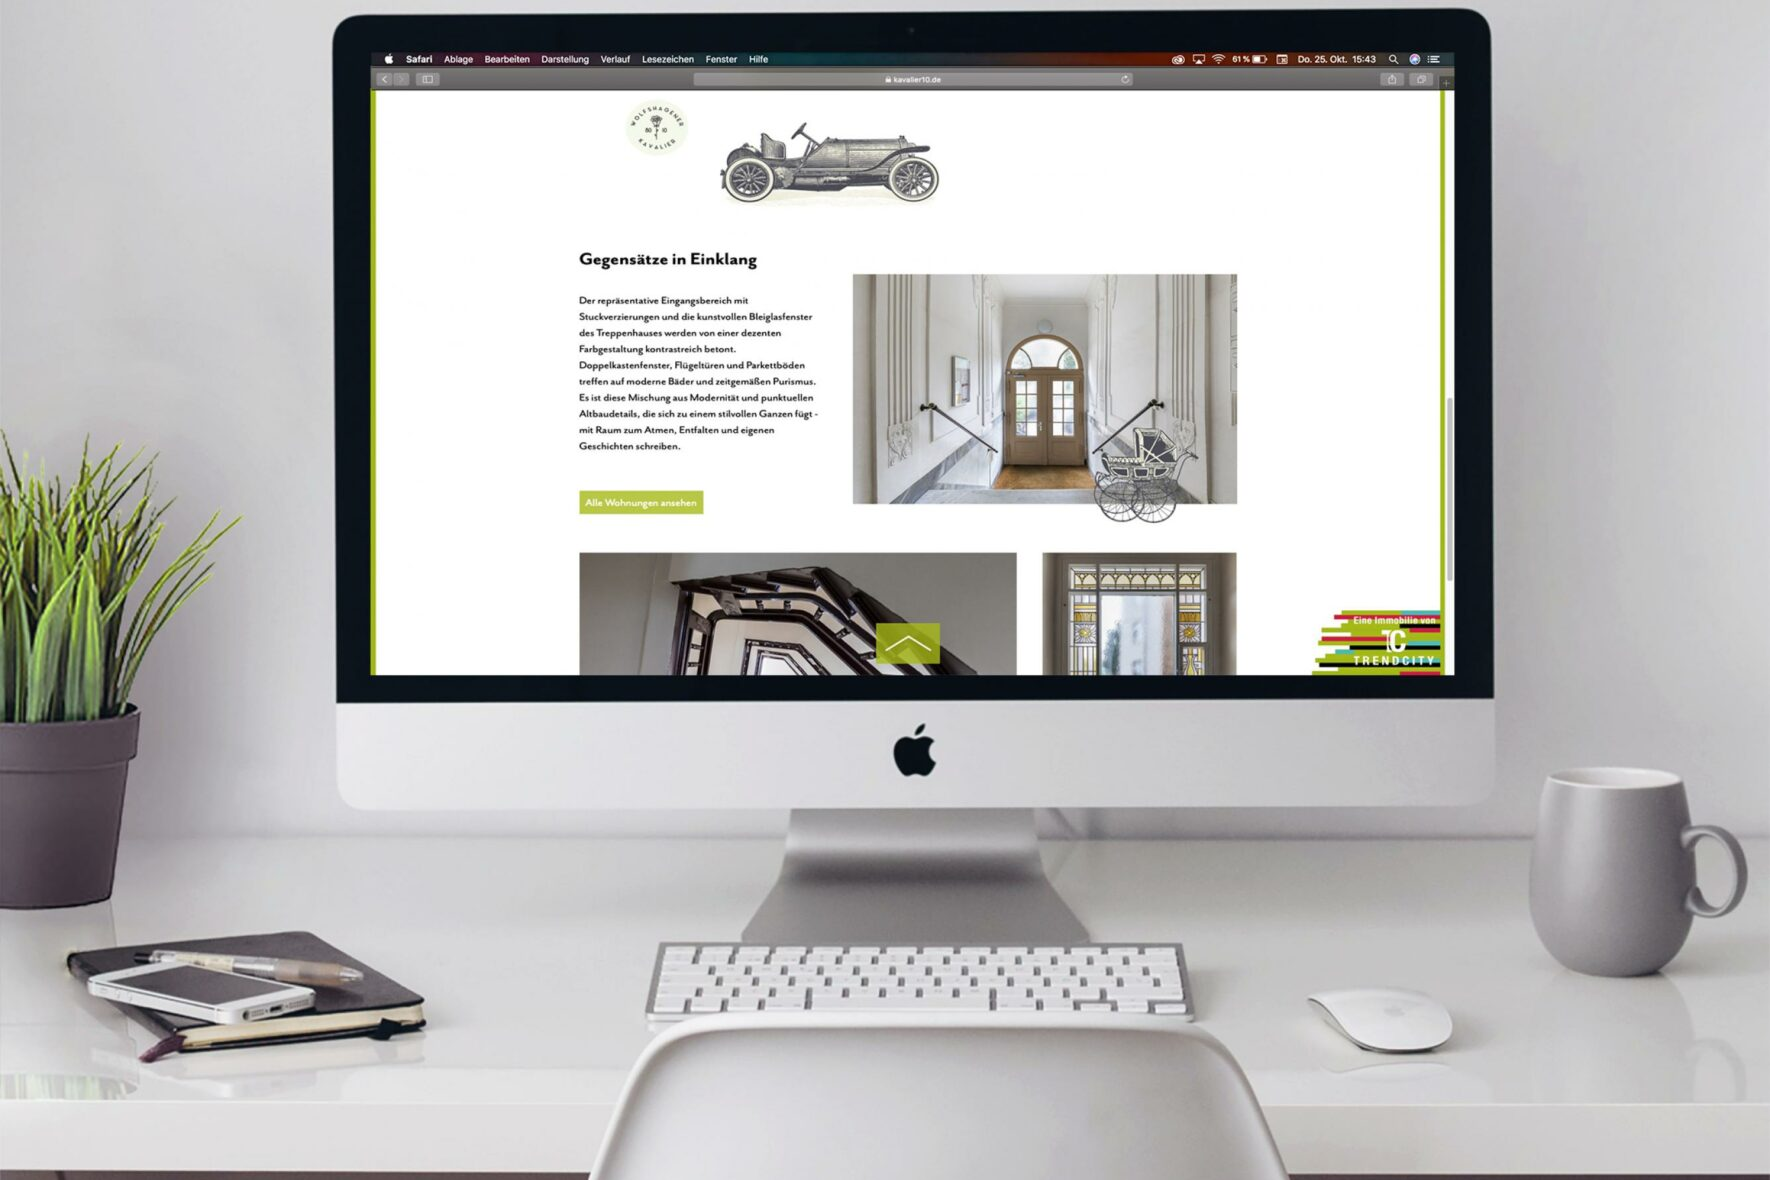 Webiste-Objekte-Branding-Trendcity-Immobilien-Kavalierstrasse-Webdesign-Corporat-Design-5